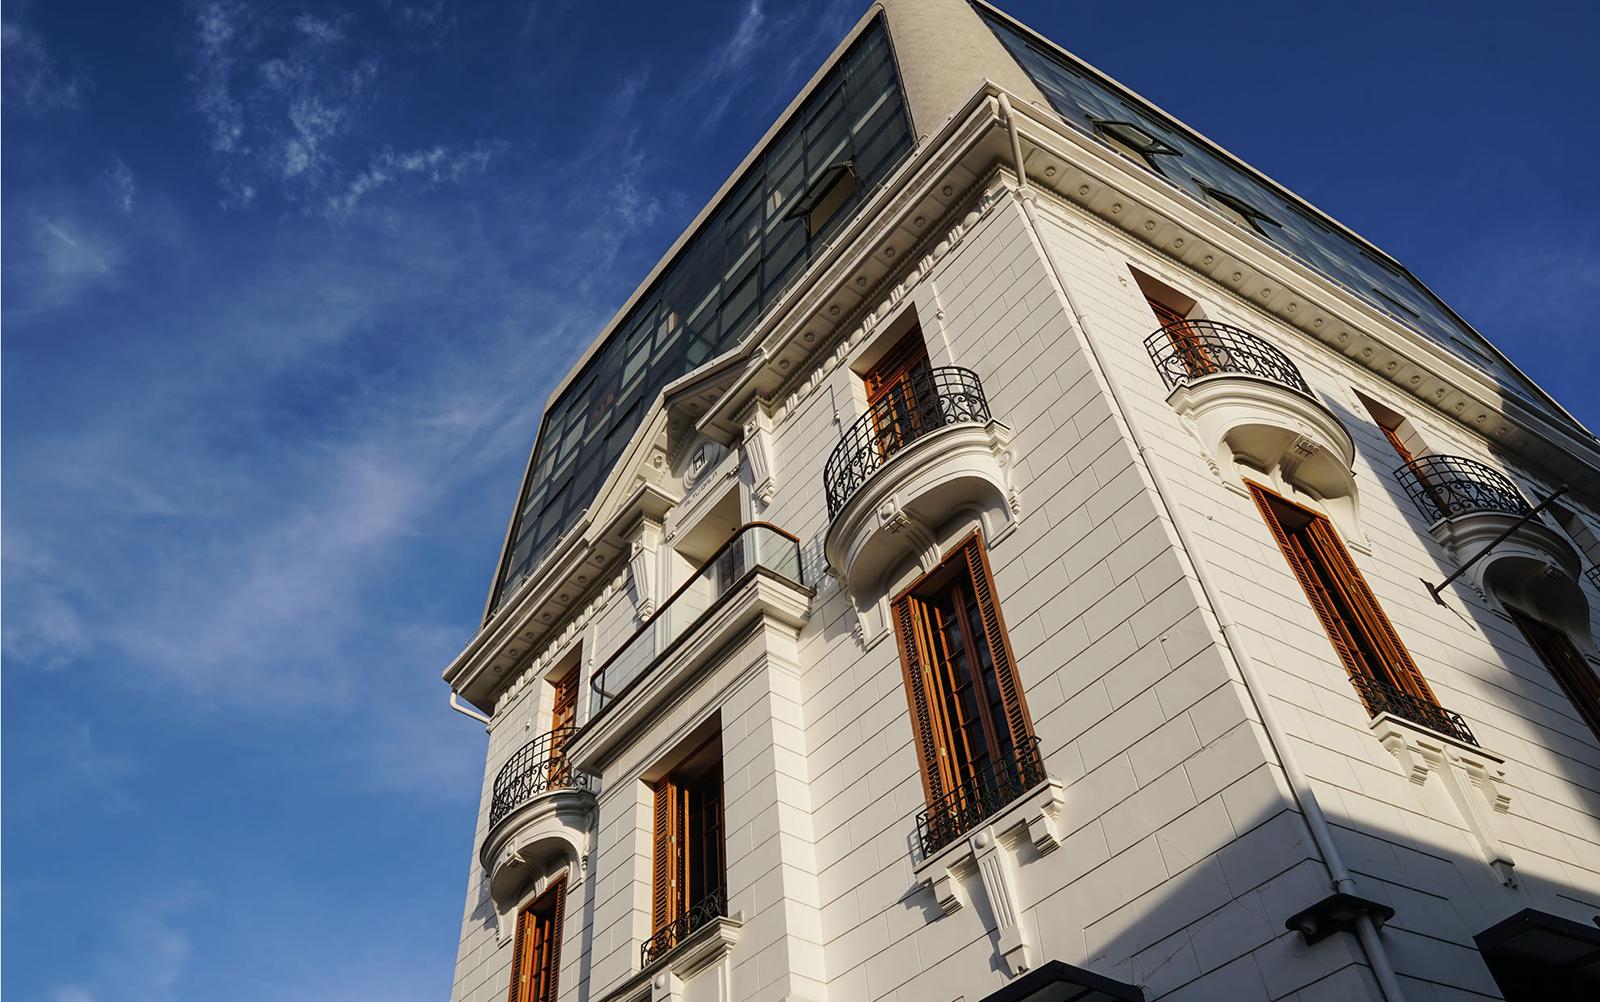 10 hotly anticipated hotels opening in 2019: Altu Qala in Las Paz, Bolivia